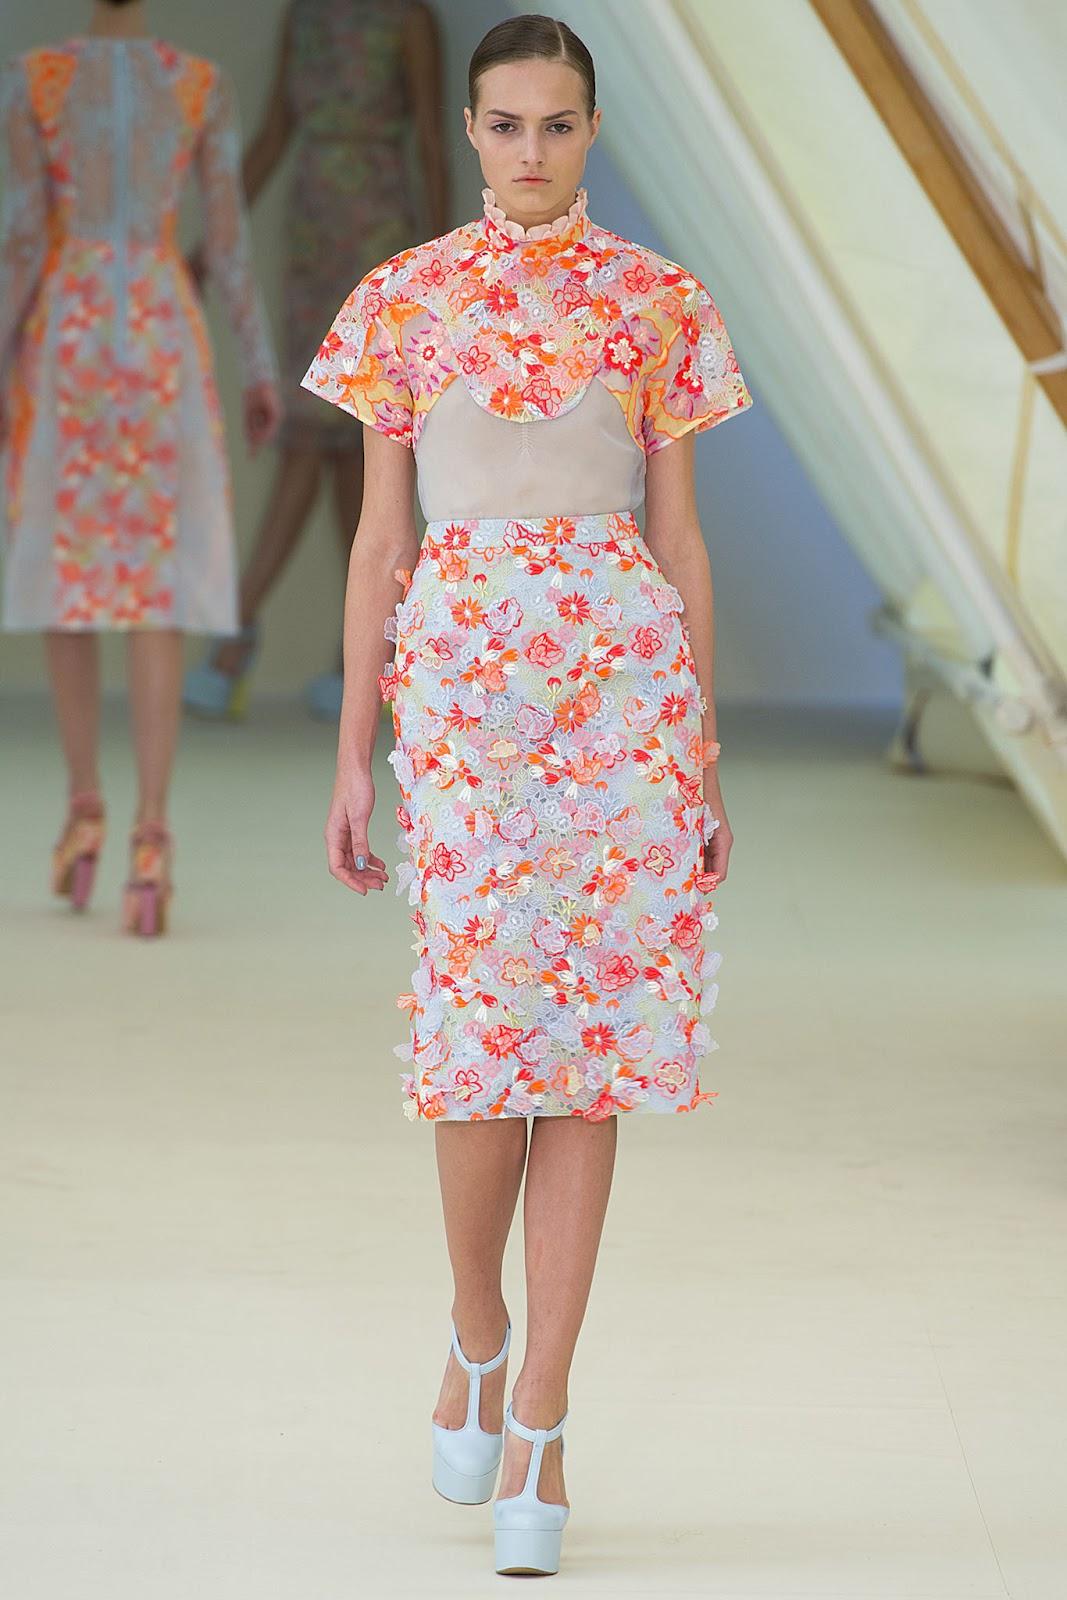 http://4.bp.blogspot.com/-kif36u9xuM4/UF5kr4KDhhI/AAAAAAAAqrs/_Q263uT9Jso/s1600/Erdem-Spring-2013-Collection-London-Fashion-Week-16.JPG